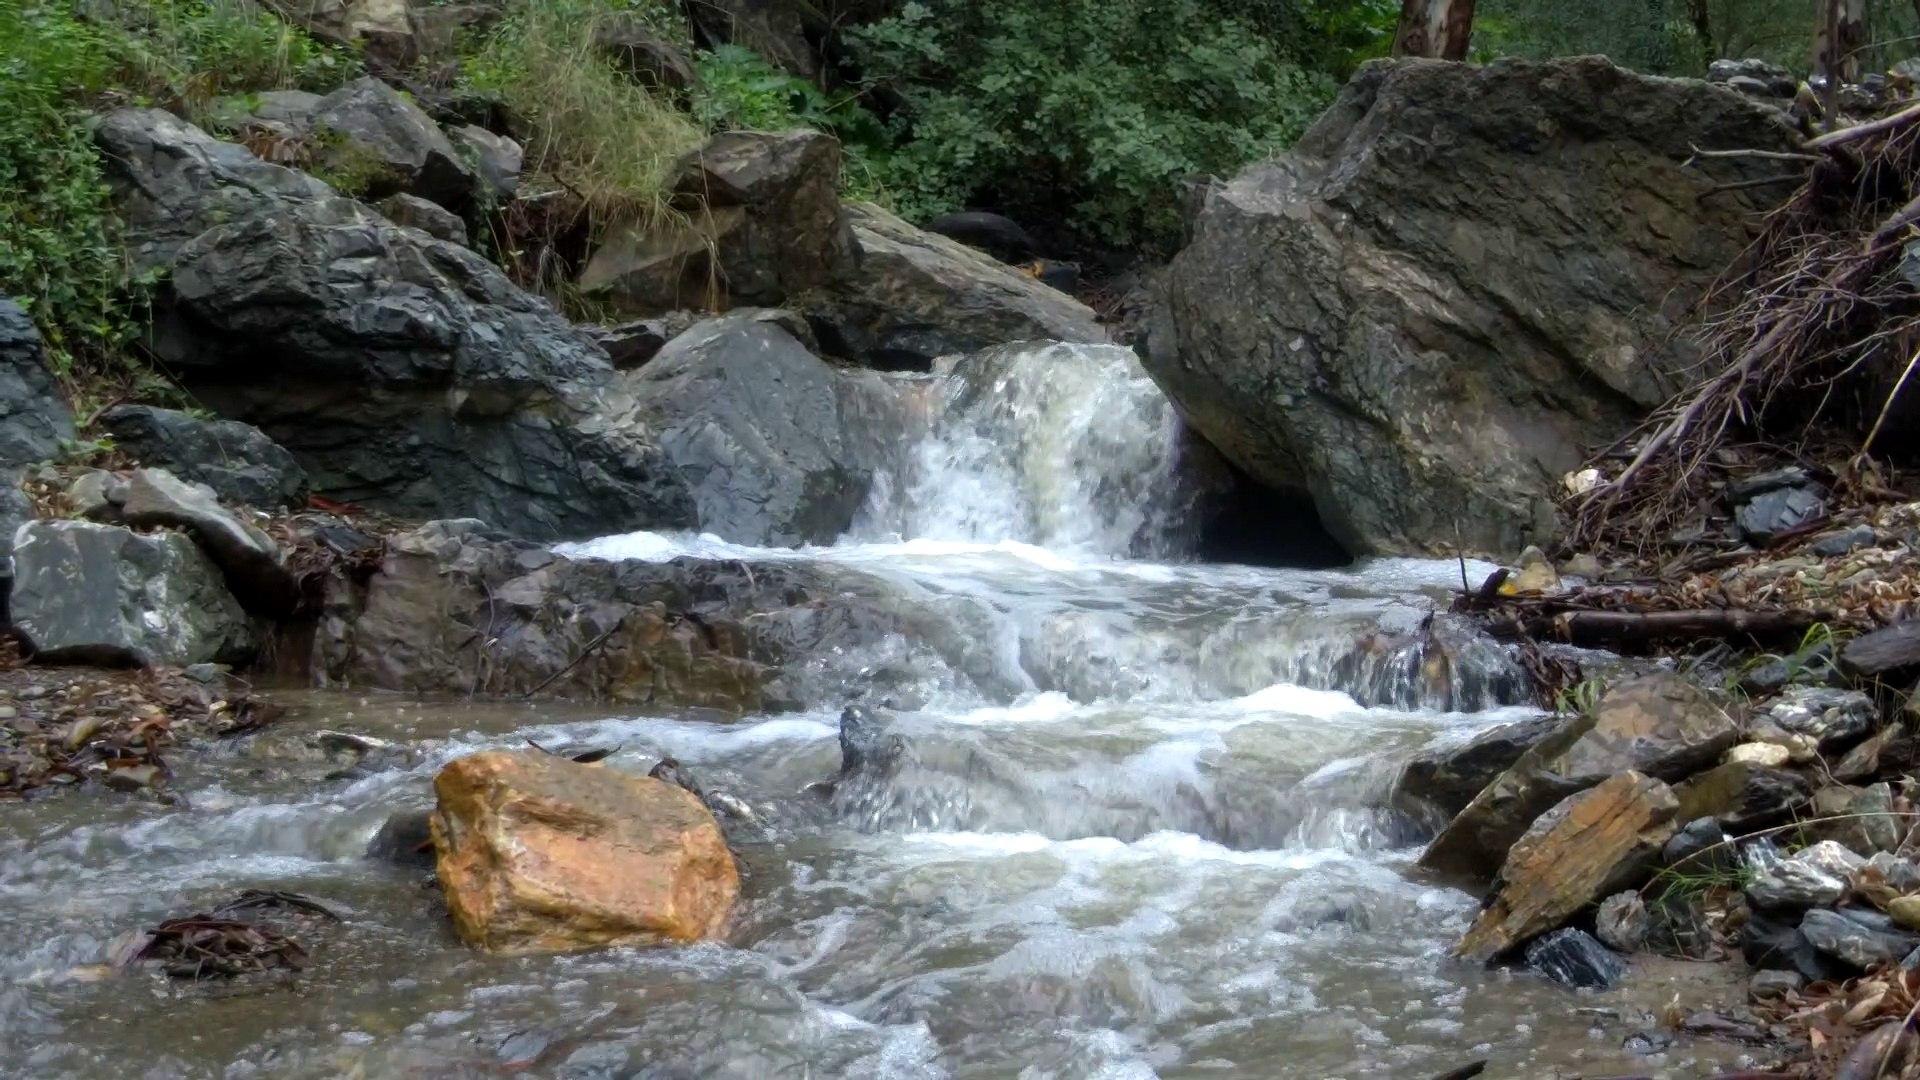 Cascada de Picapedreros (Tráiler a cámara lenta)